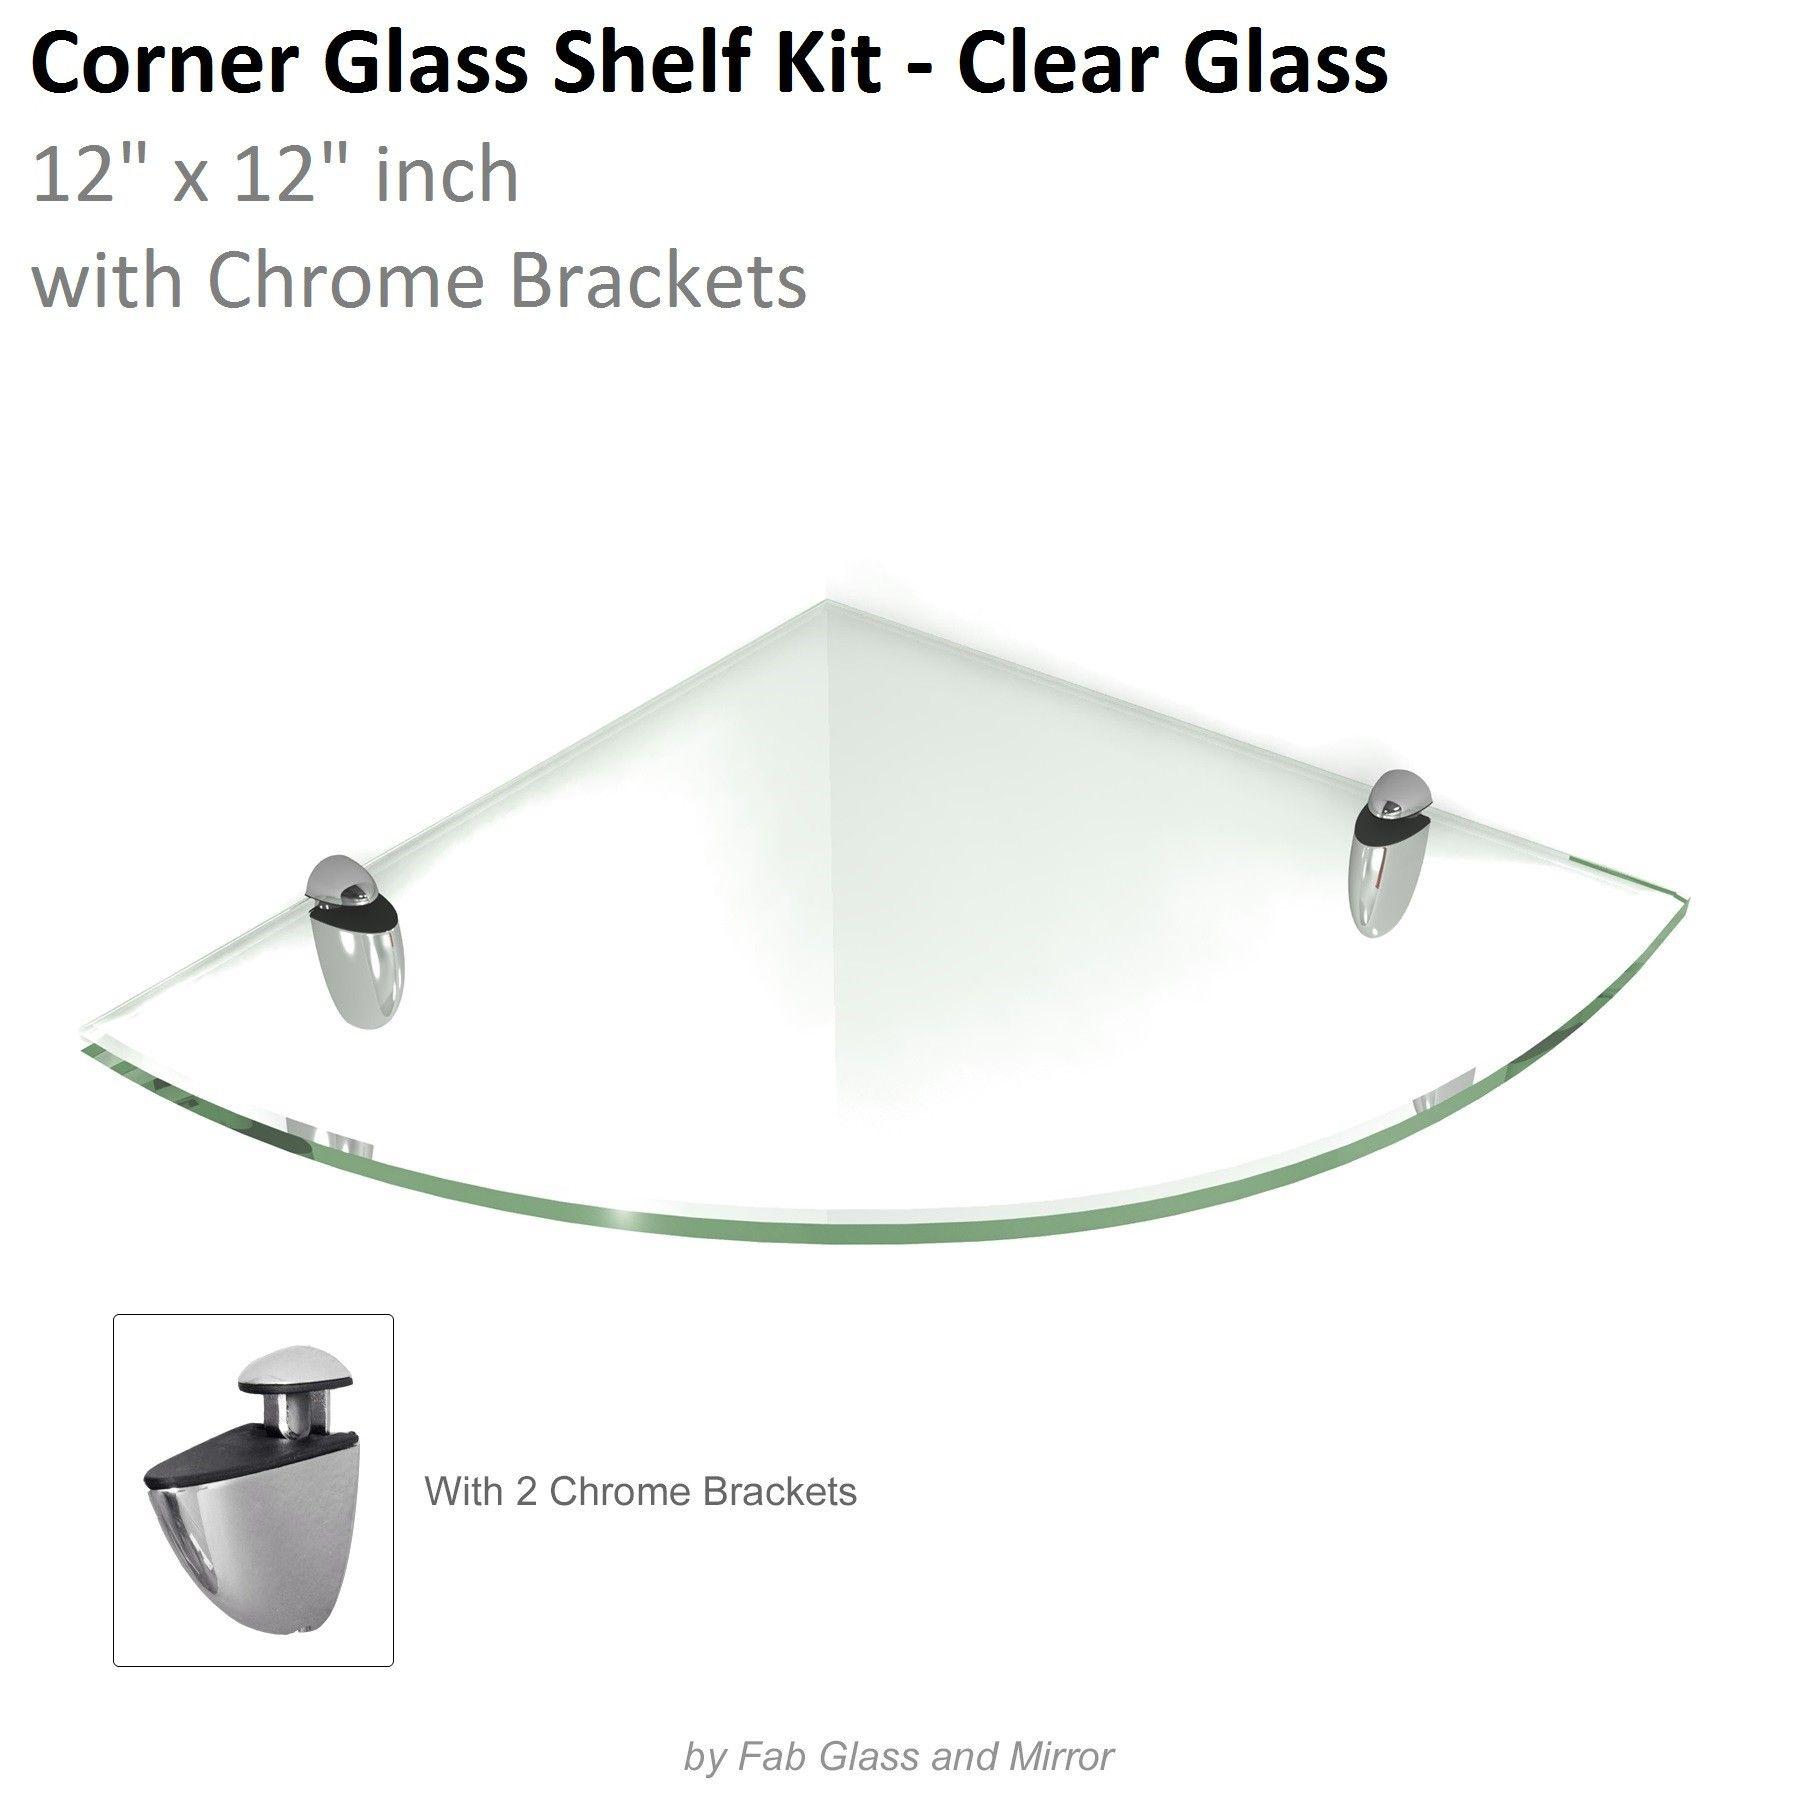 Clear Floating Glass Shelves (Corner) 12x12 inch w/ Brackets ...